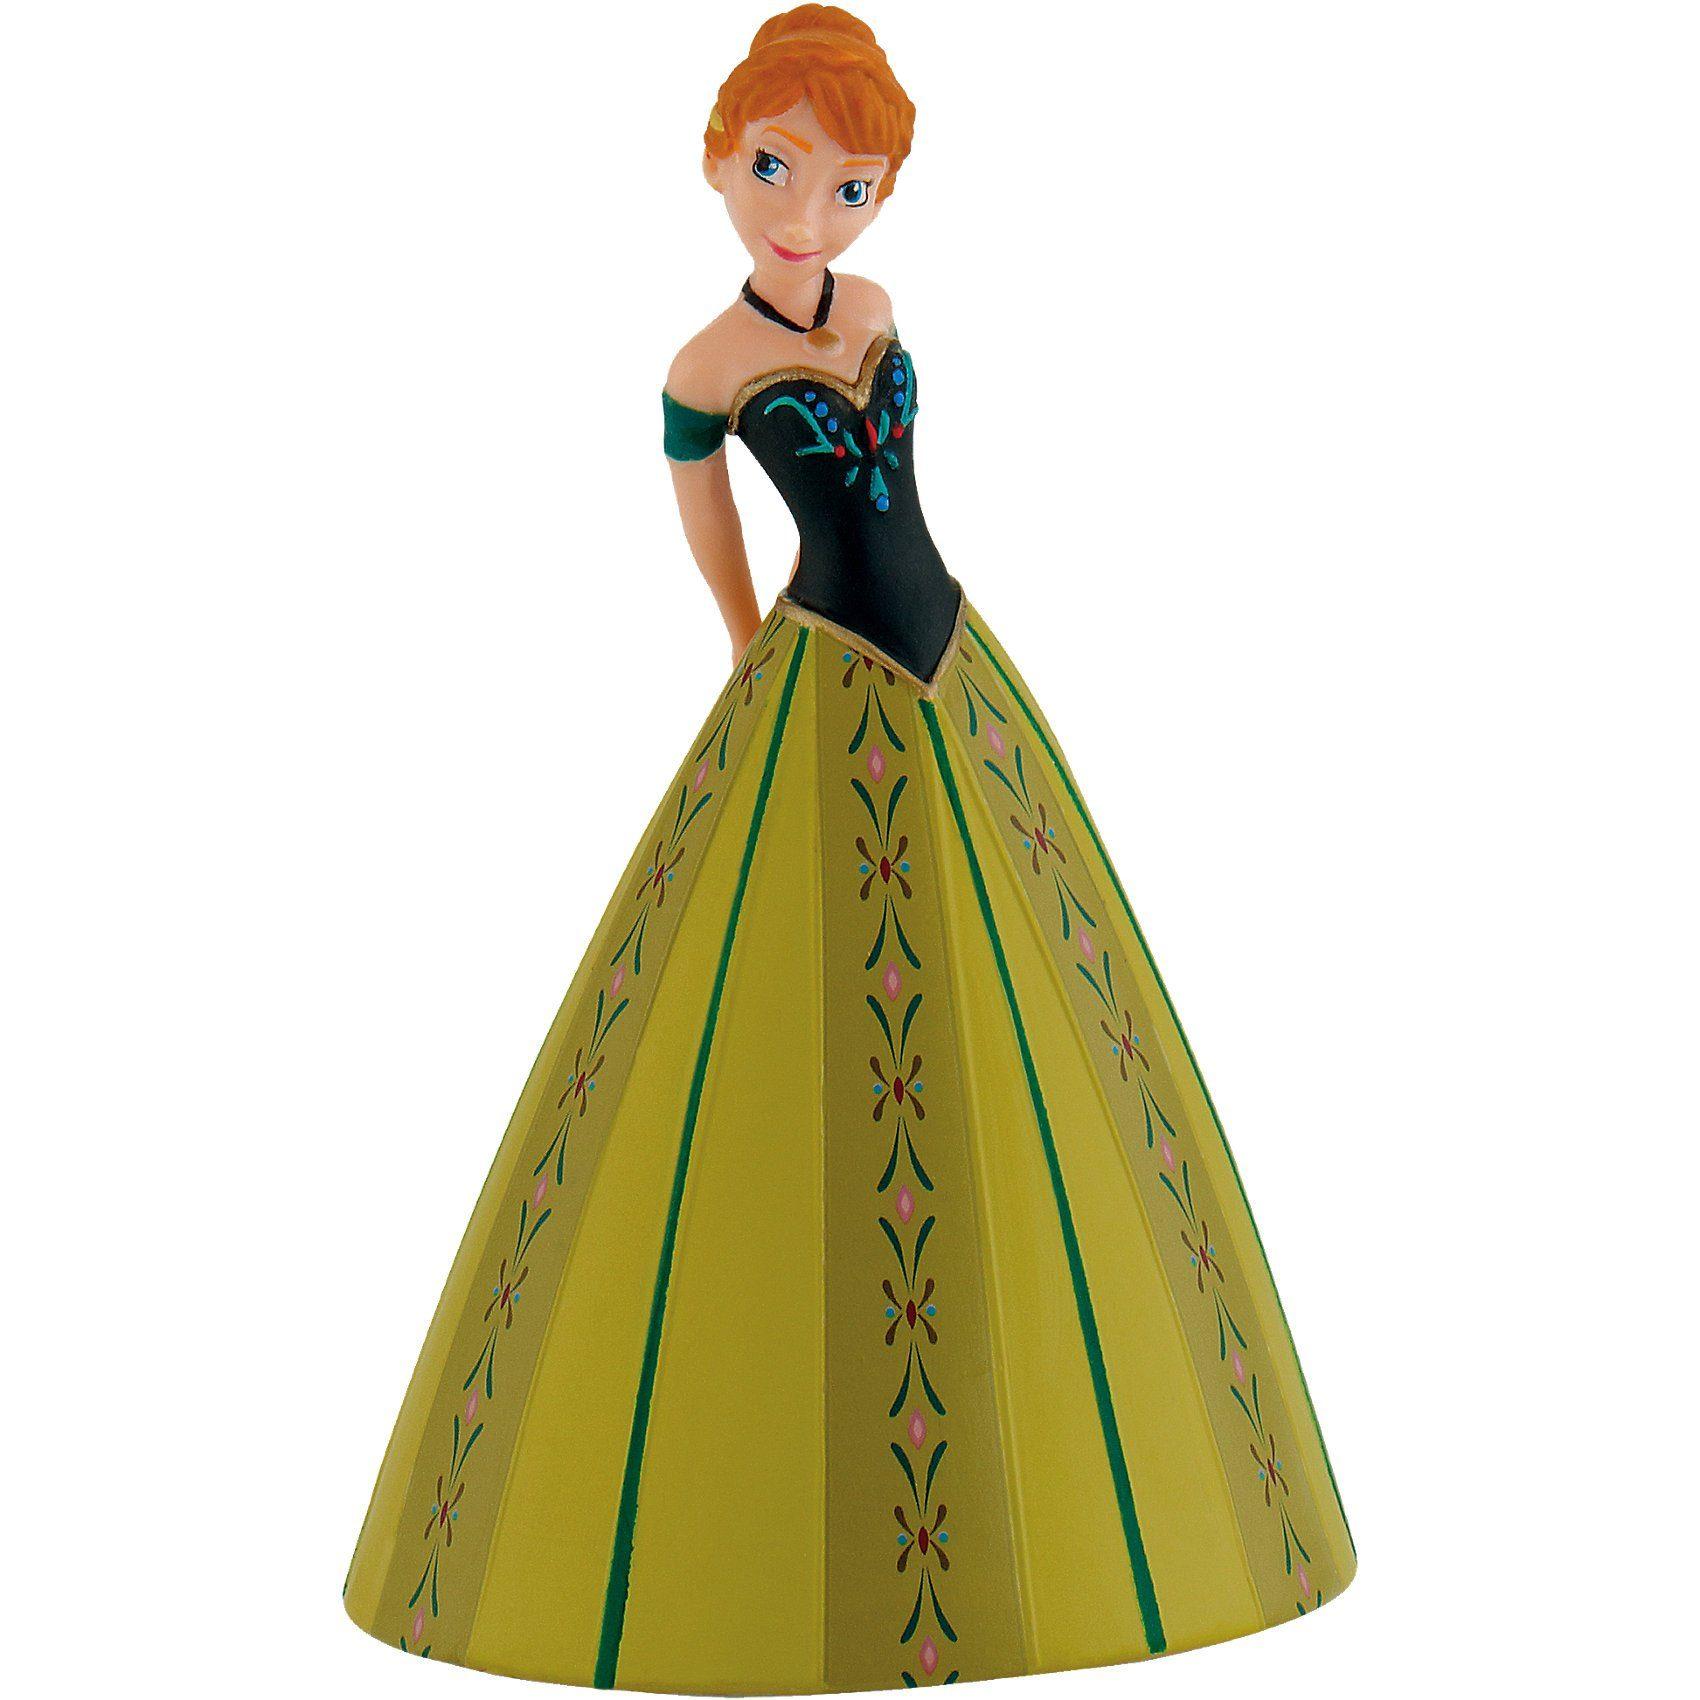 BULLYLAND Comicwelt - Walt Disney Die Eiskönigin - Prinzessin Anna